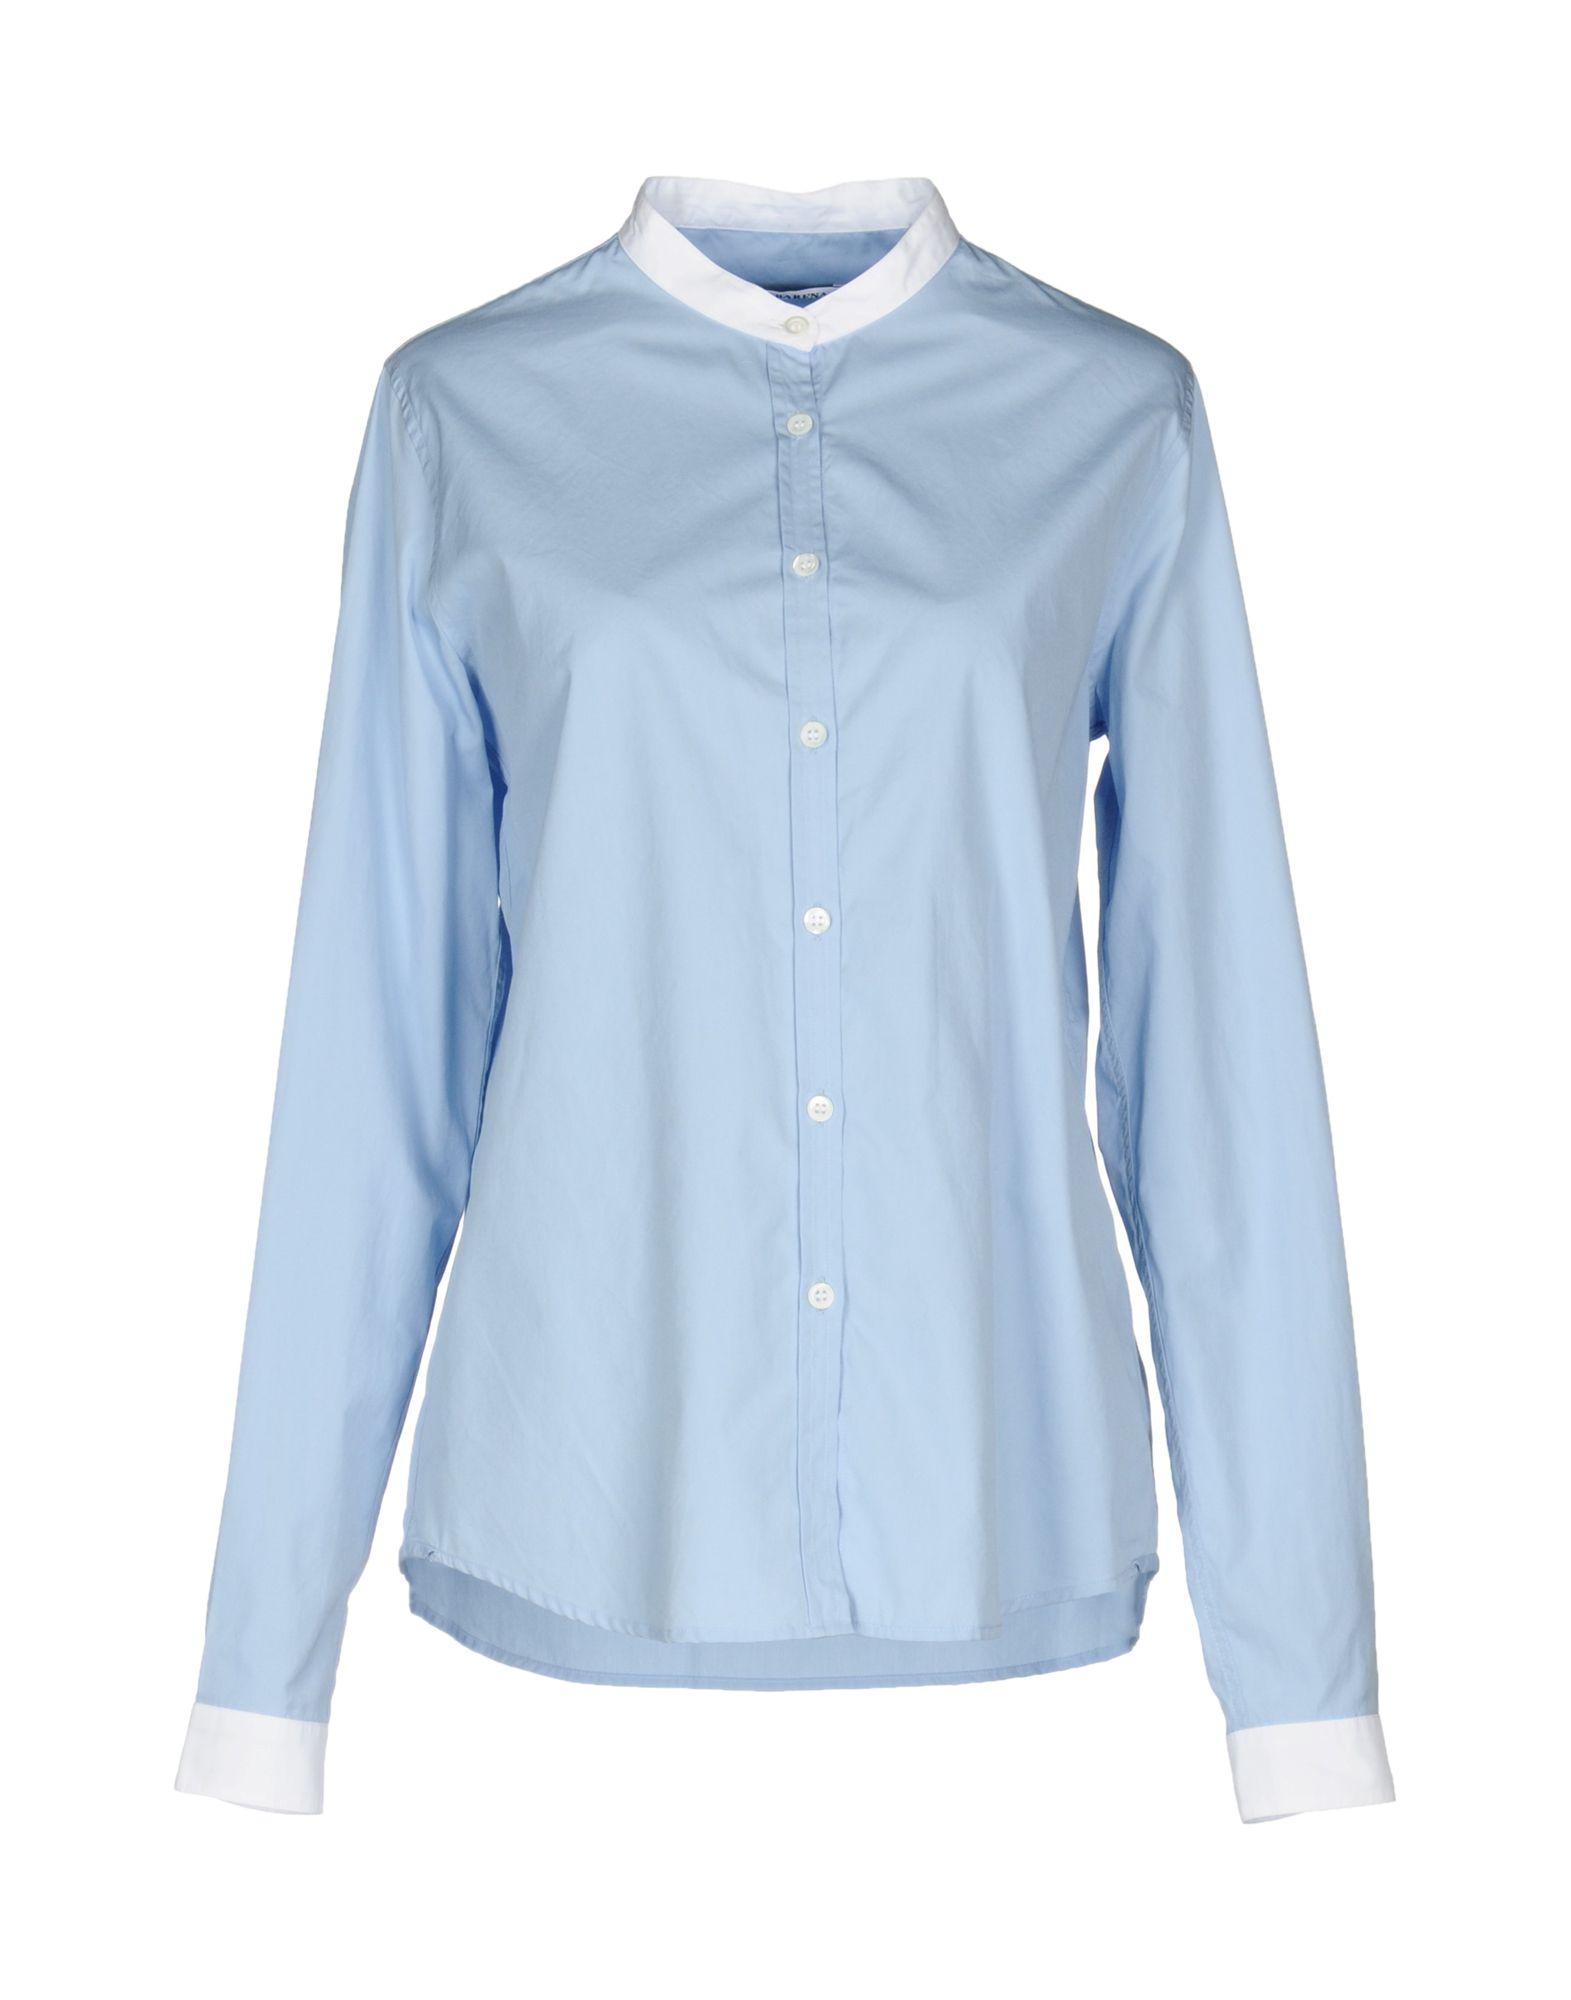 Barena Venezia Solid Color Shirts & Blouses In Sky Blue